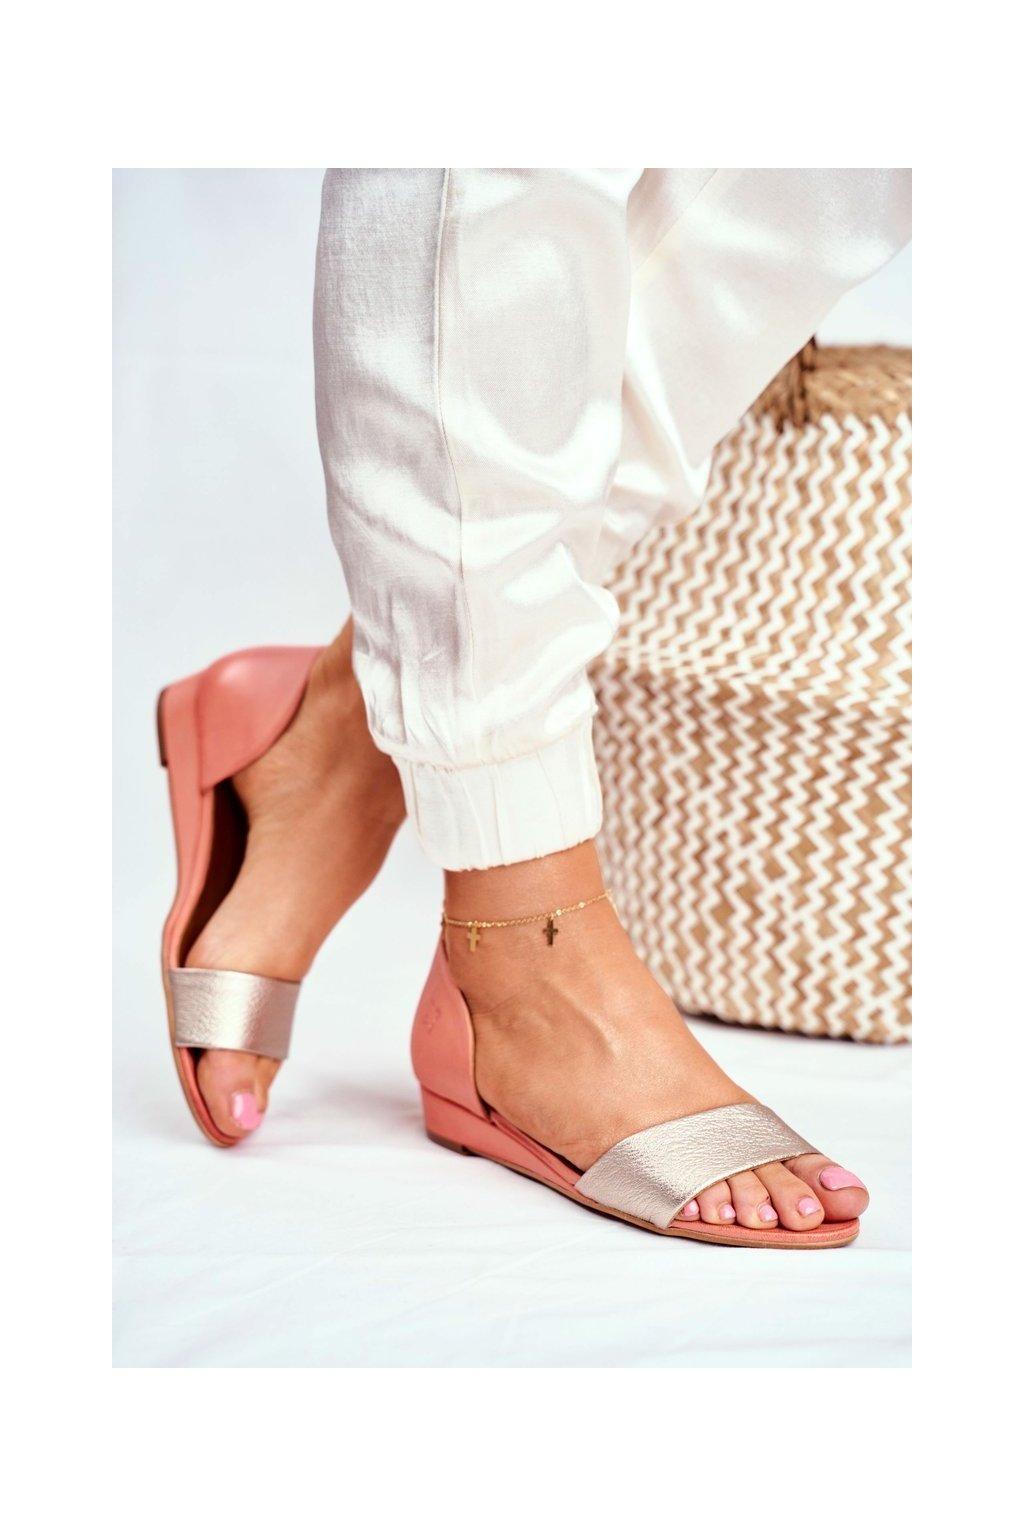 Dámske sandále s plochou podrážkou farba žltá kód obuvi 01971-48/00-5 BRZOSKWINIA